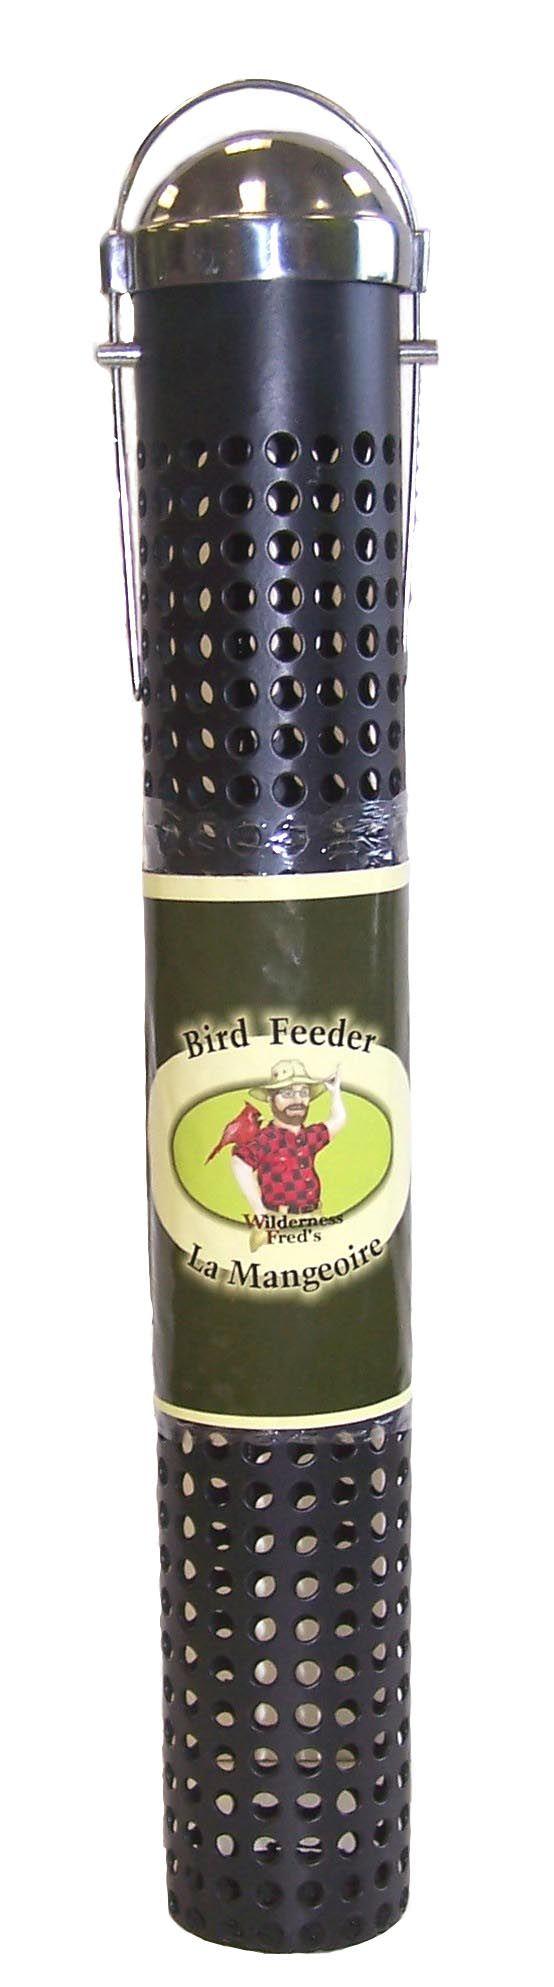 "SF16 16"" Metal Peanut & sunflower feeder 16"" Black Steel Peanut and Sunflower Feeder. Silver lid. hangs. Woodpecker Friendly!"